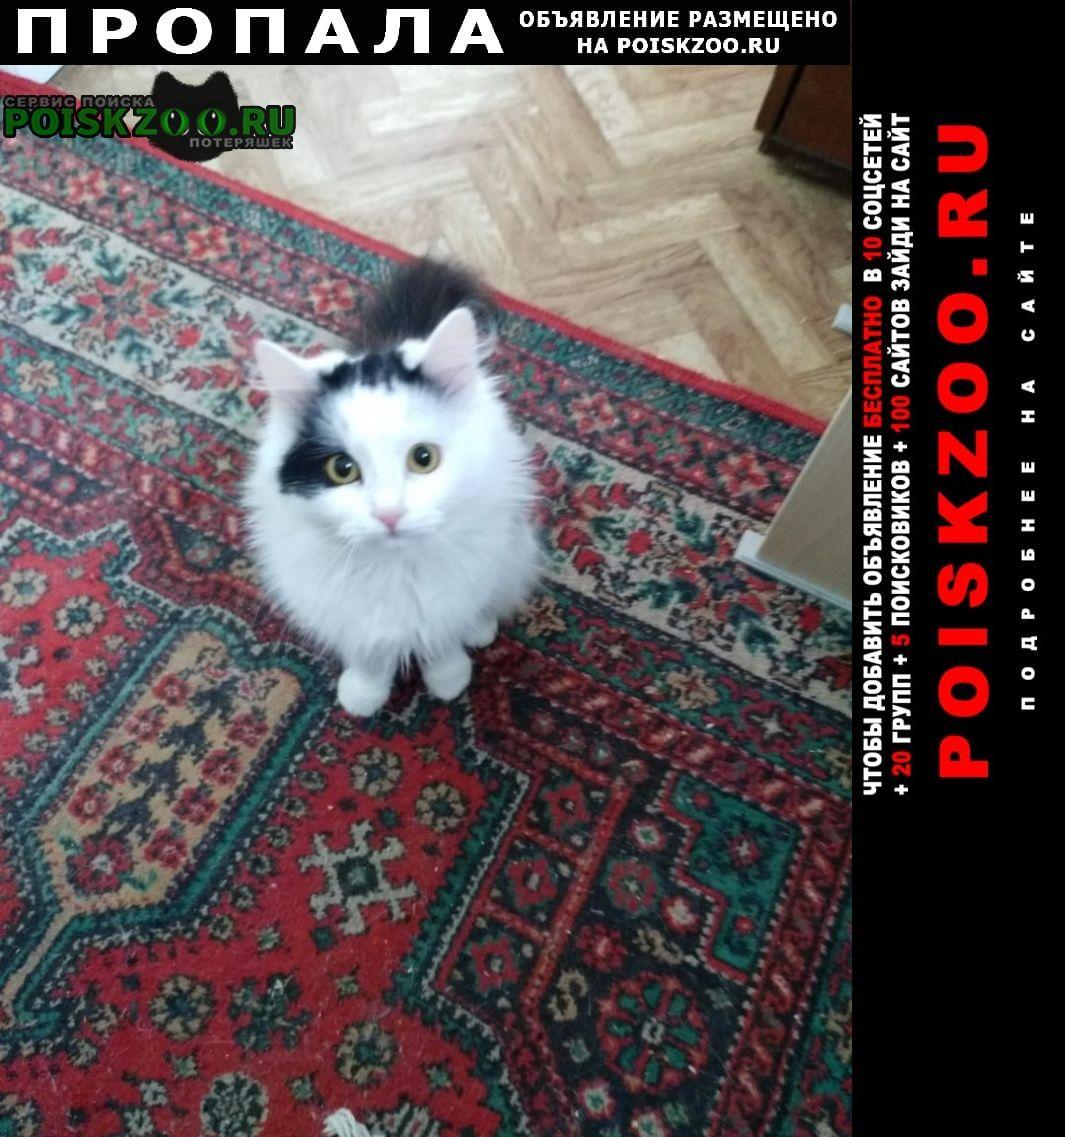 Пропала кошка Орск